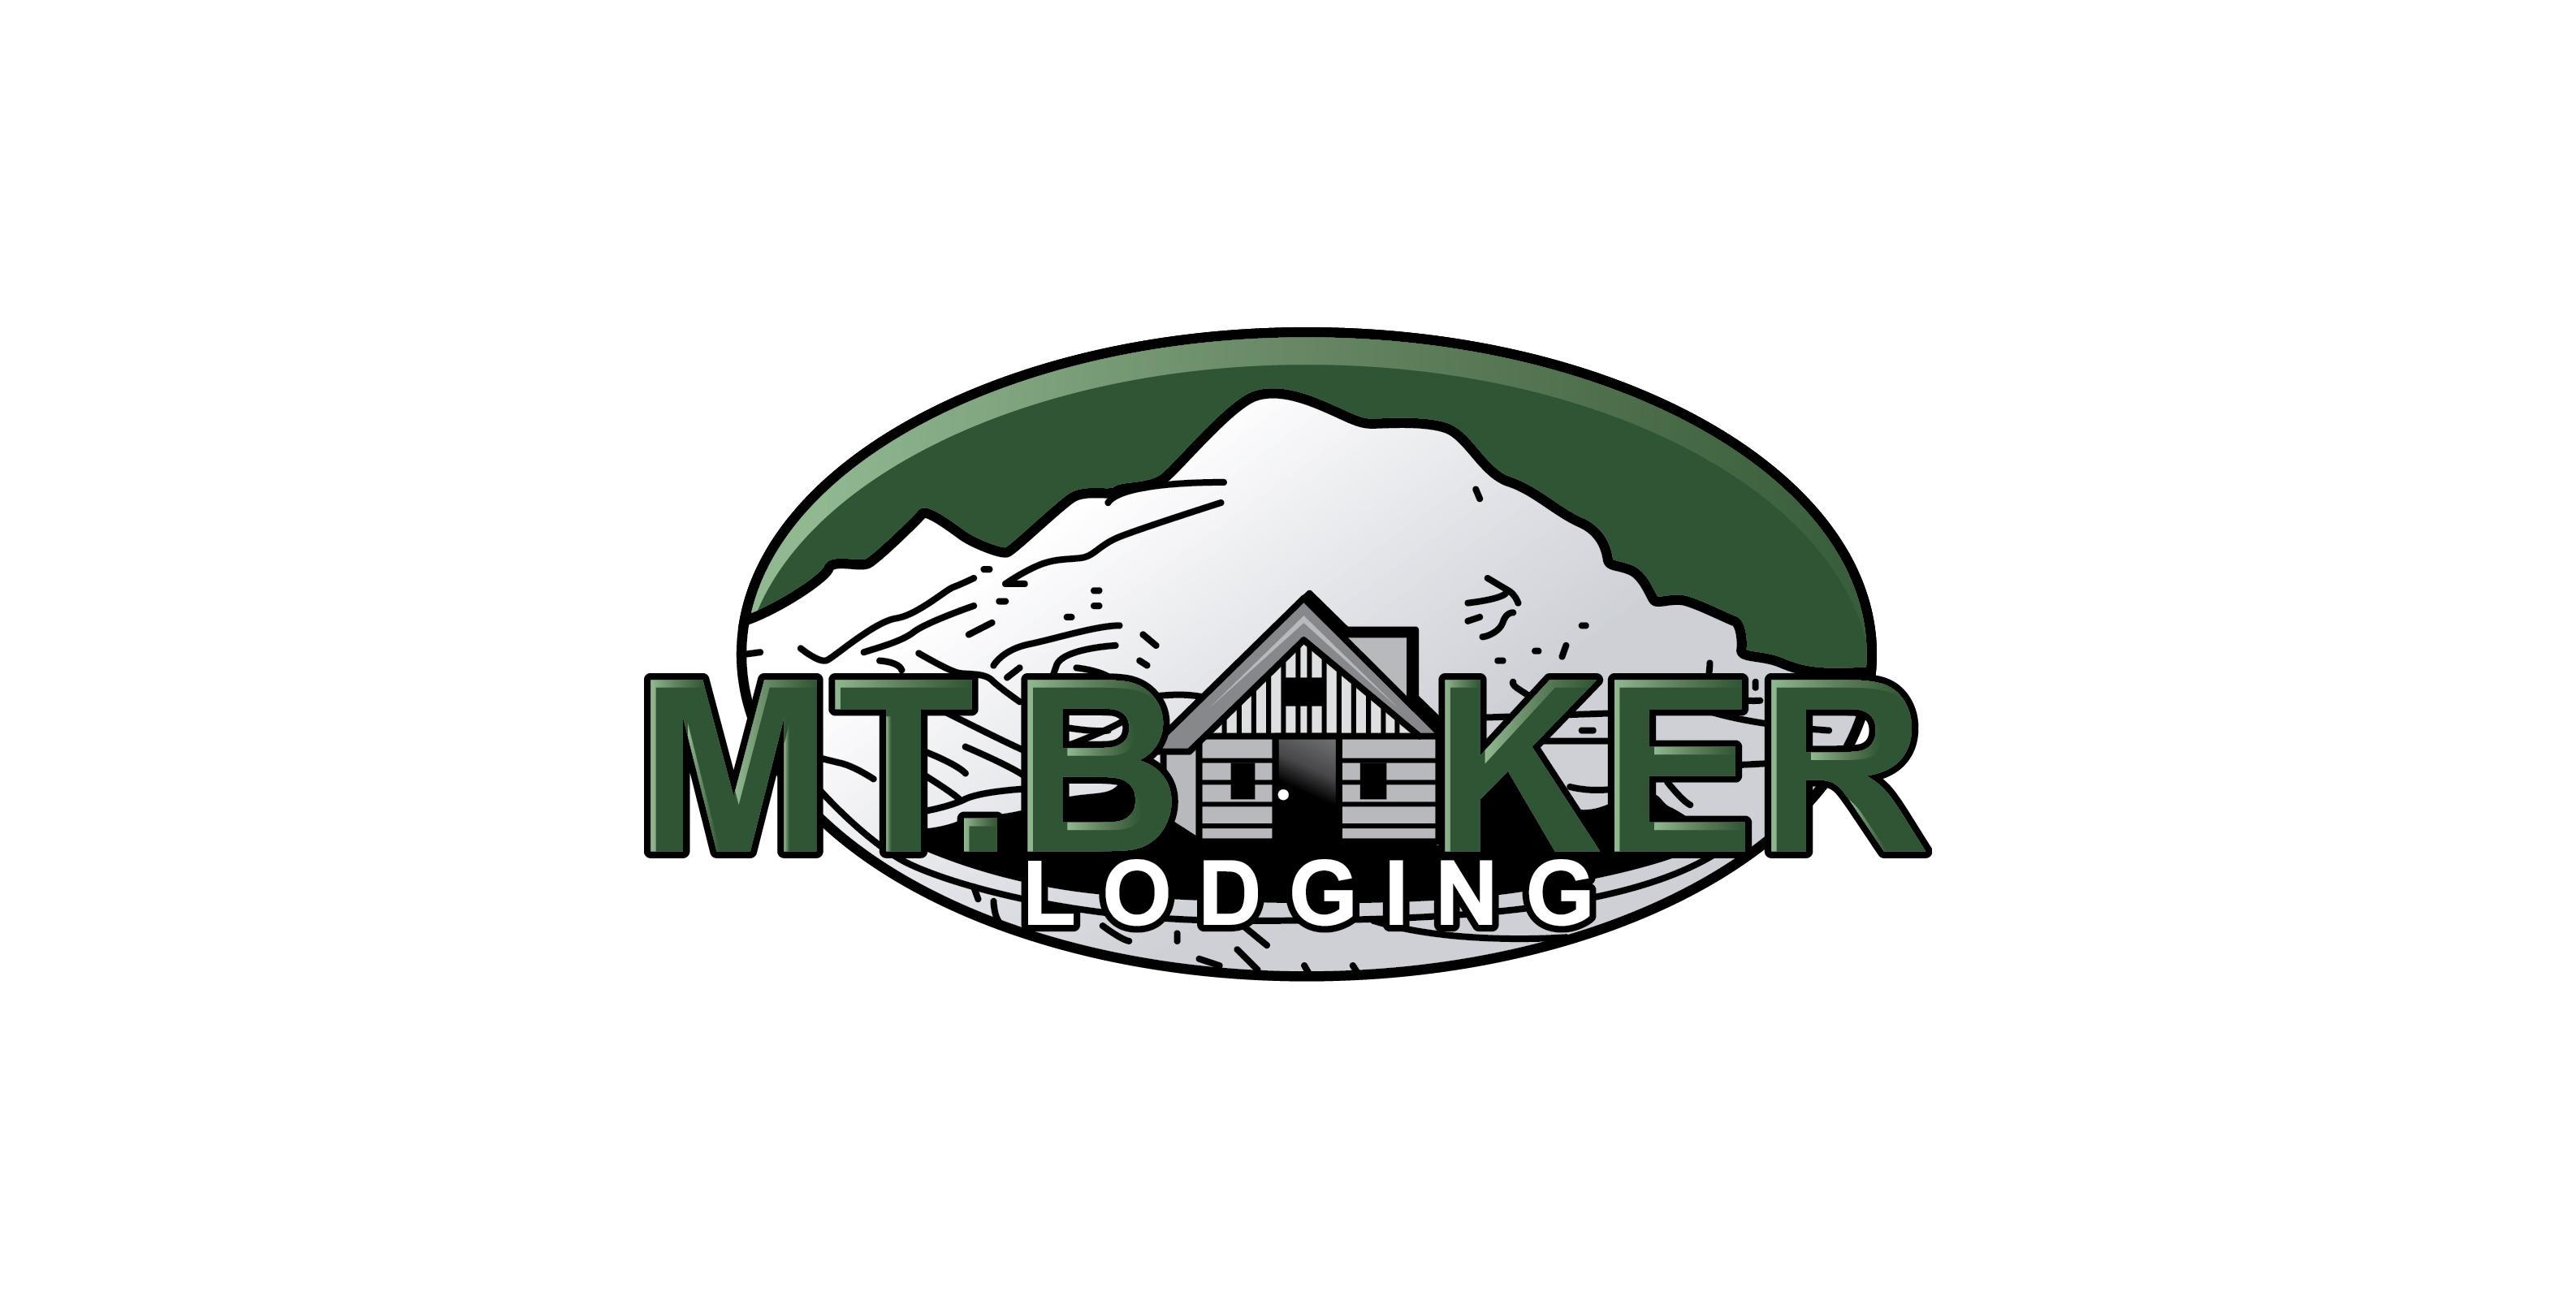 Apartment Mt  Baker Lodging Condo  06  ndash  FIREPLACE  DISHWASHER  W D  SLEEPS 7  photo 31816812